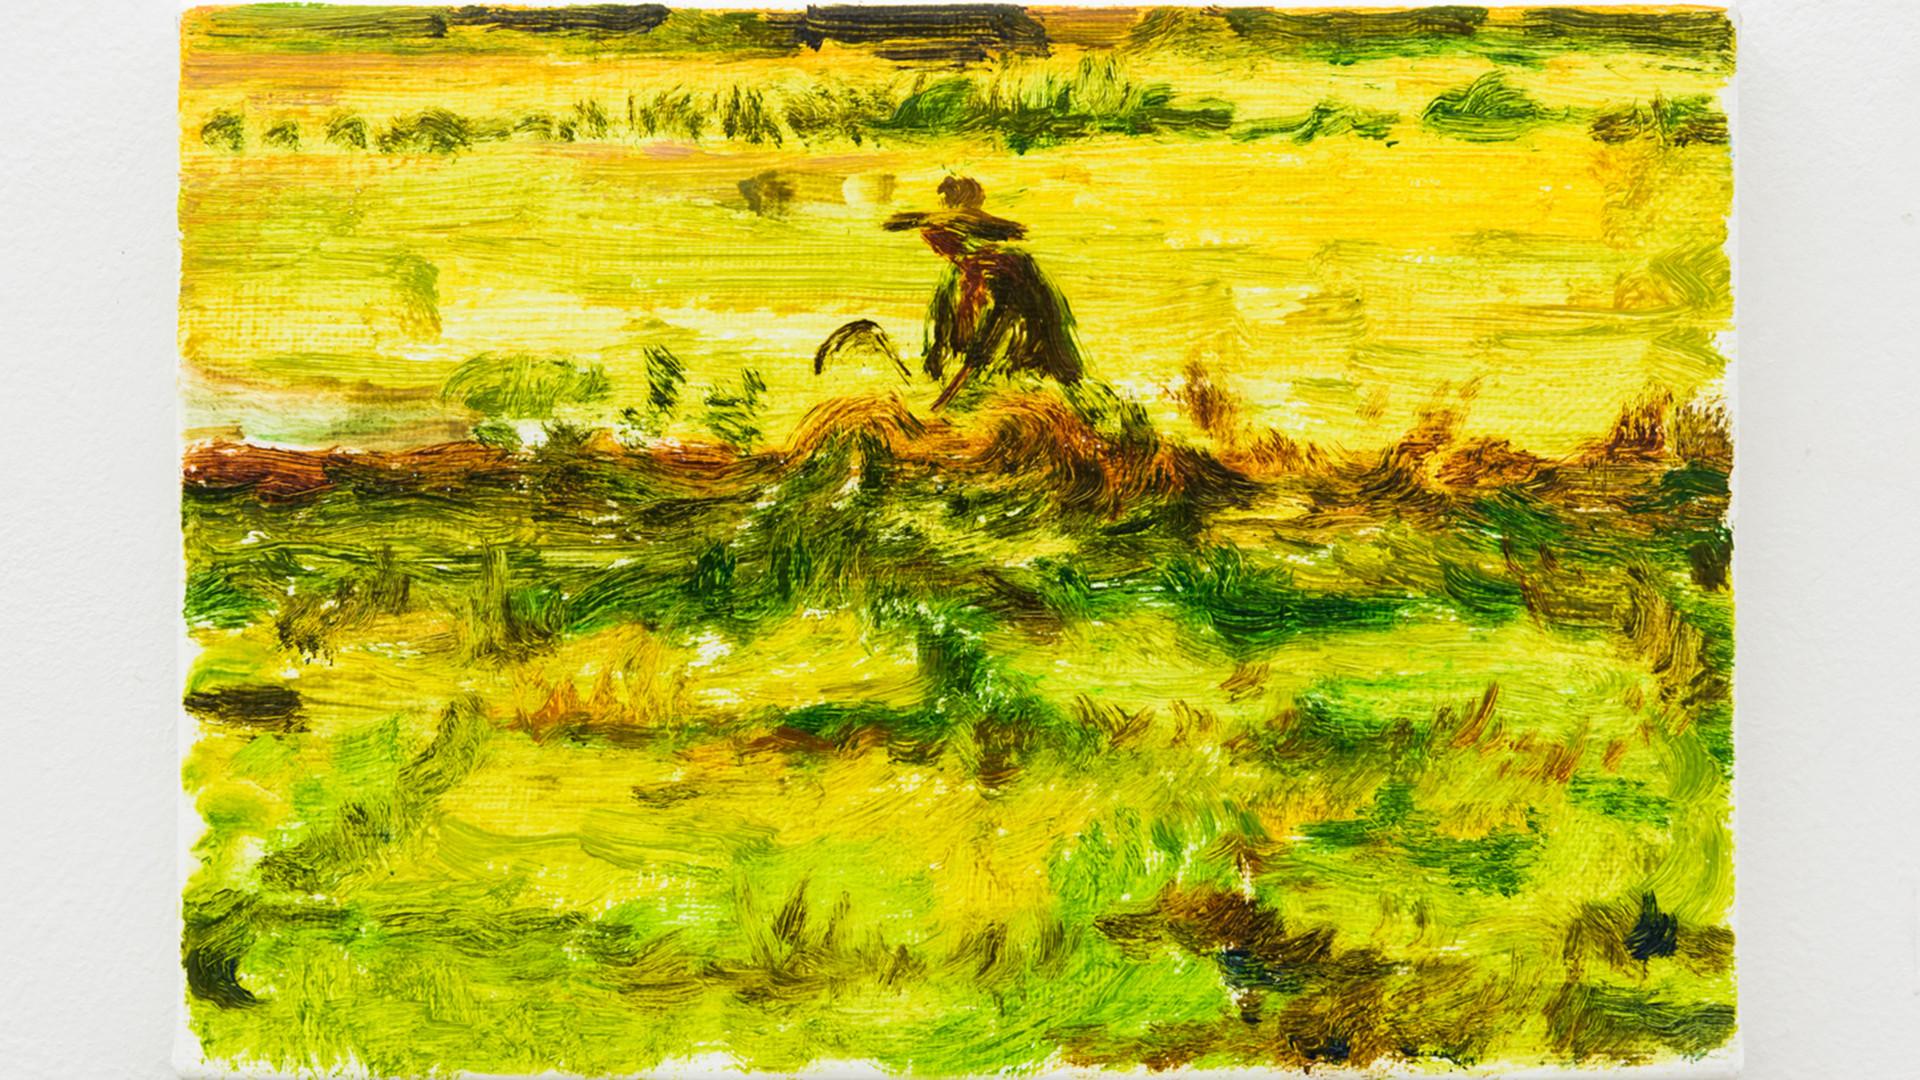 Hyein Lee, 2016, 9, 5 18시30분-19시12분 풀베기, 2016, oil on canvas, 15.5x23cm